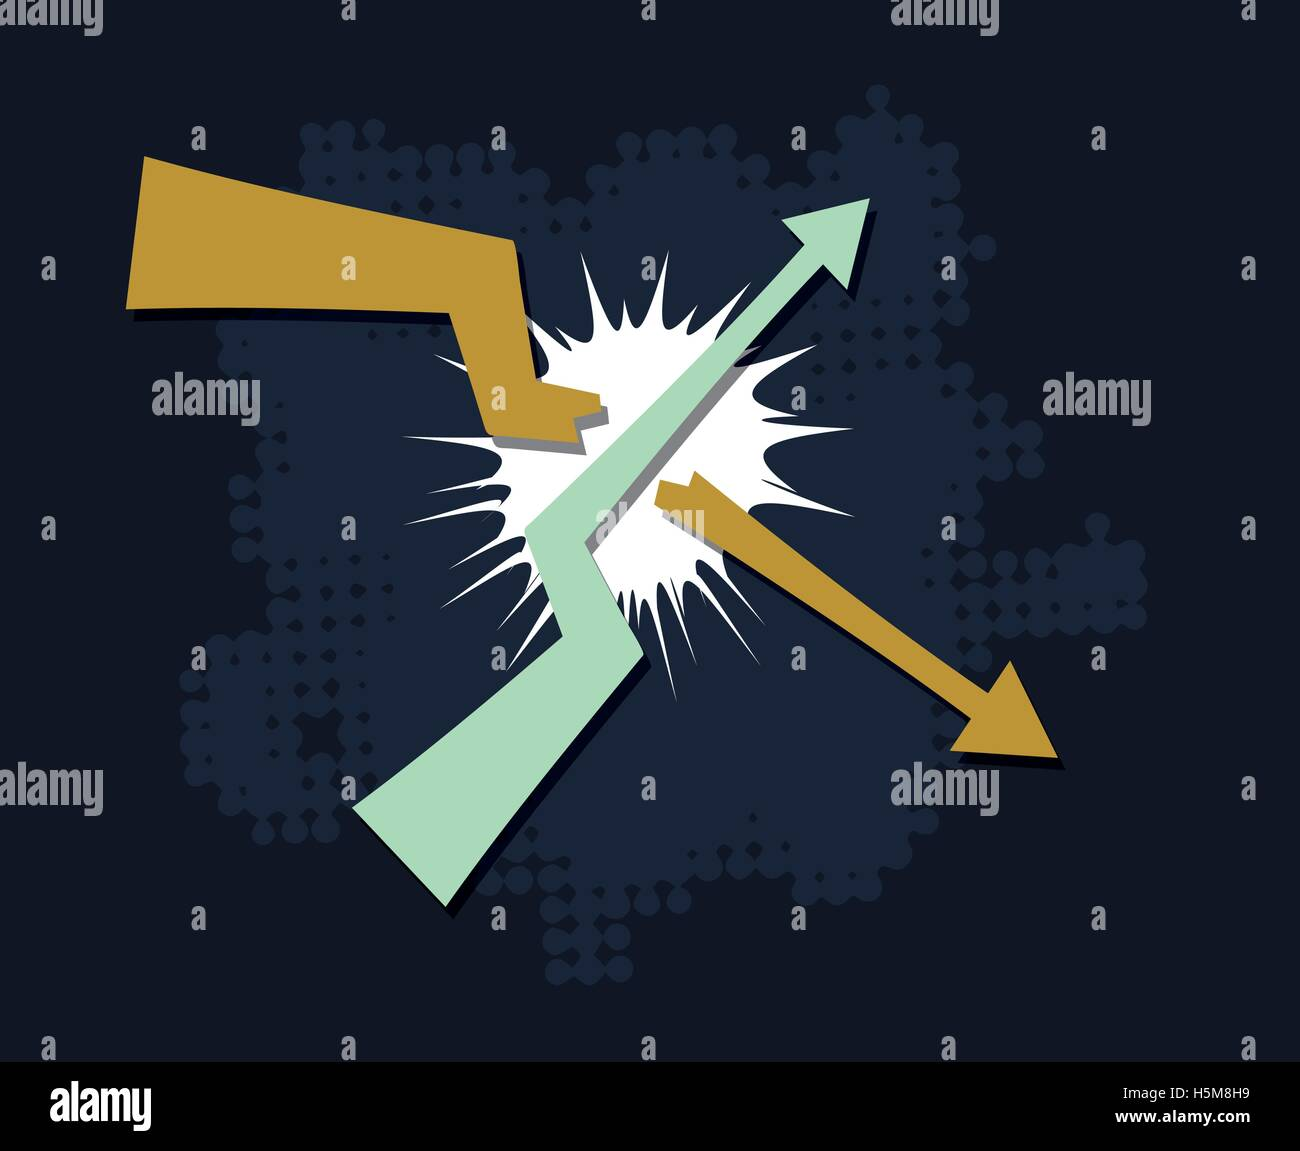 trends break symbol financial market success concept abstract vector illustration - Stock Image